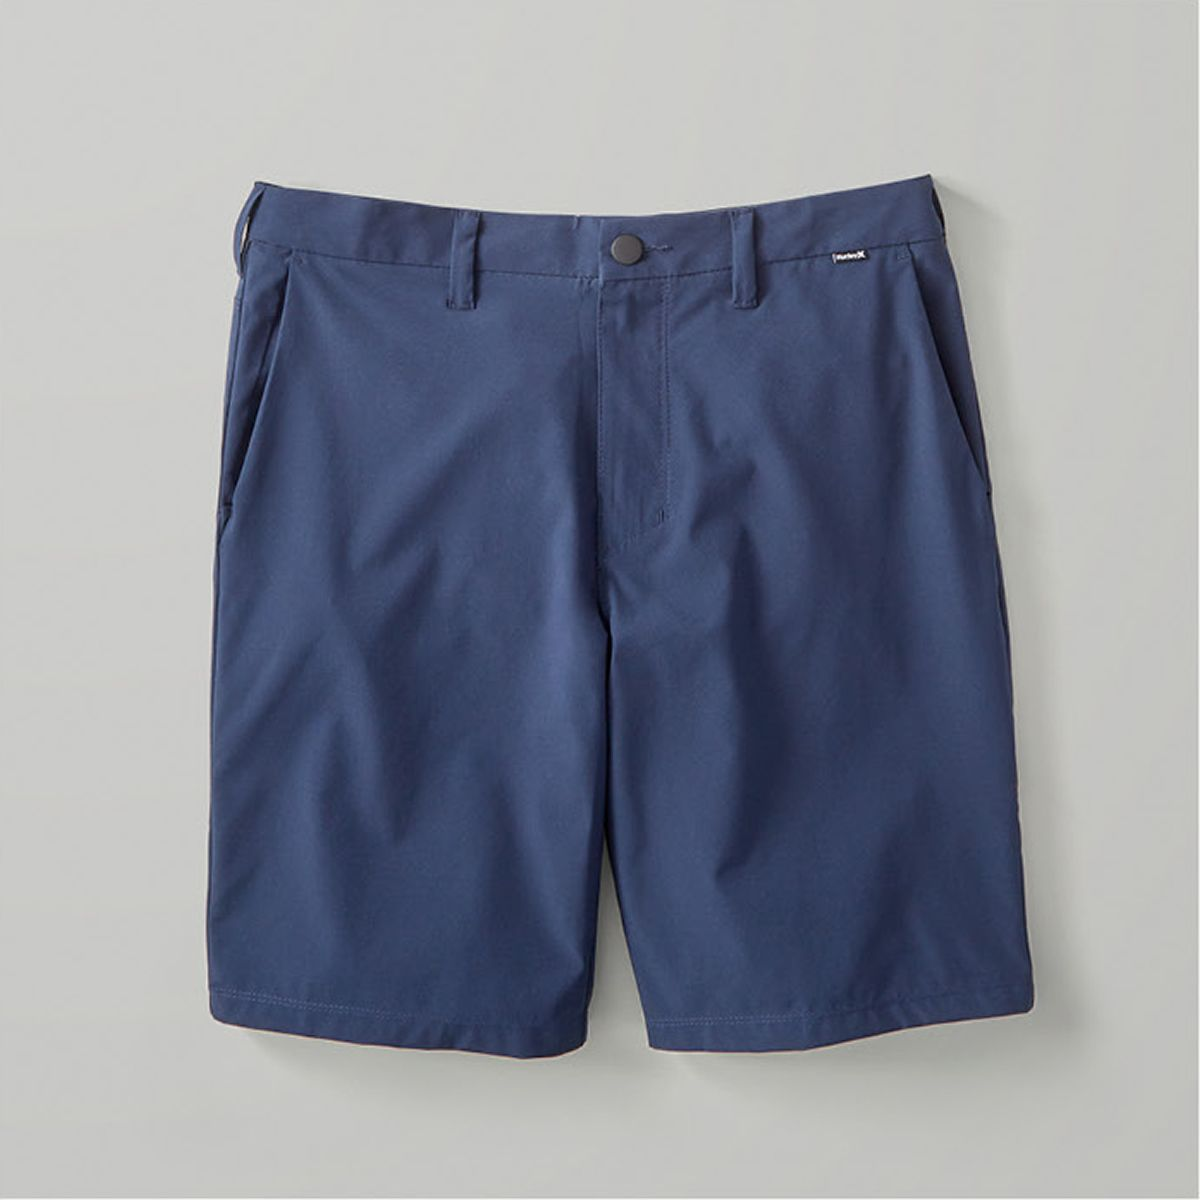 c3119094b1945 Red Mens Swimwear   Men s Swim Trunks - Macy s